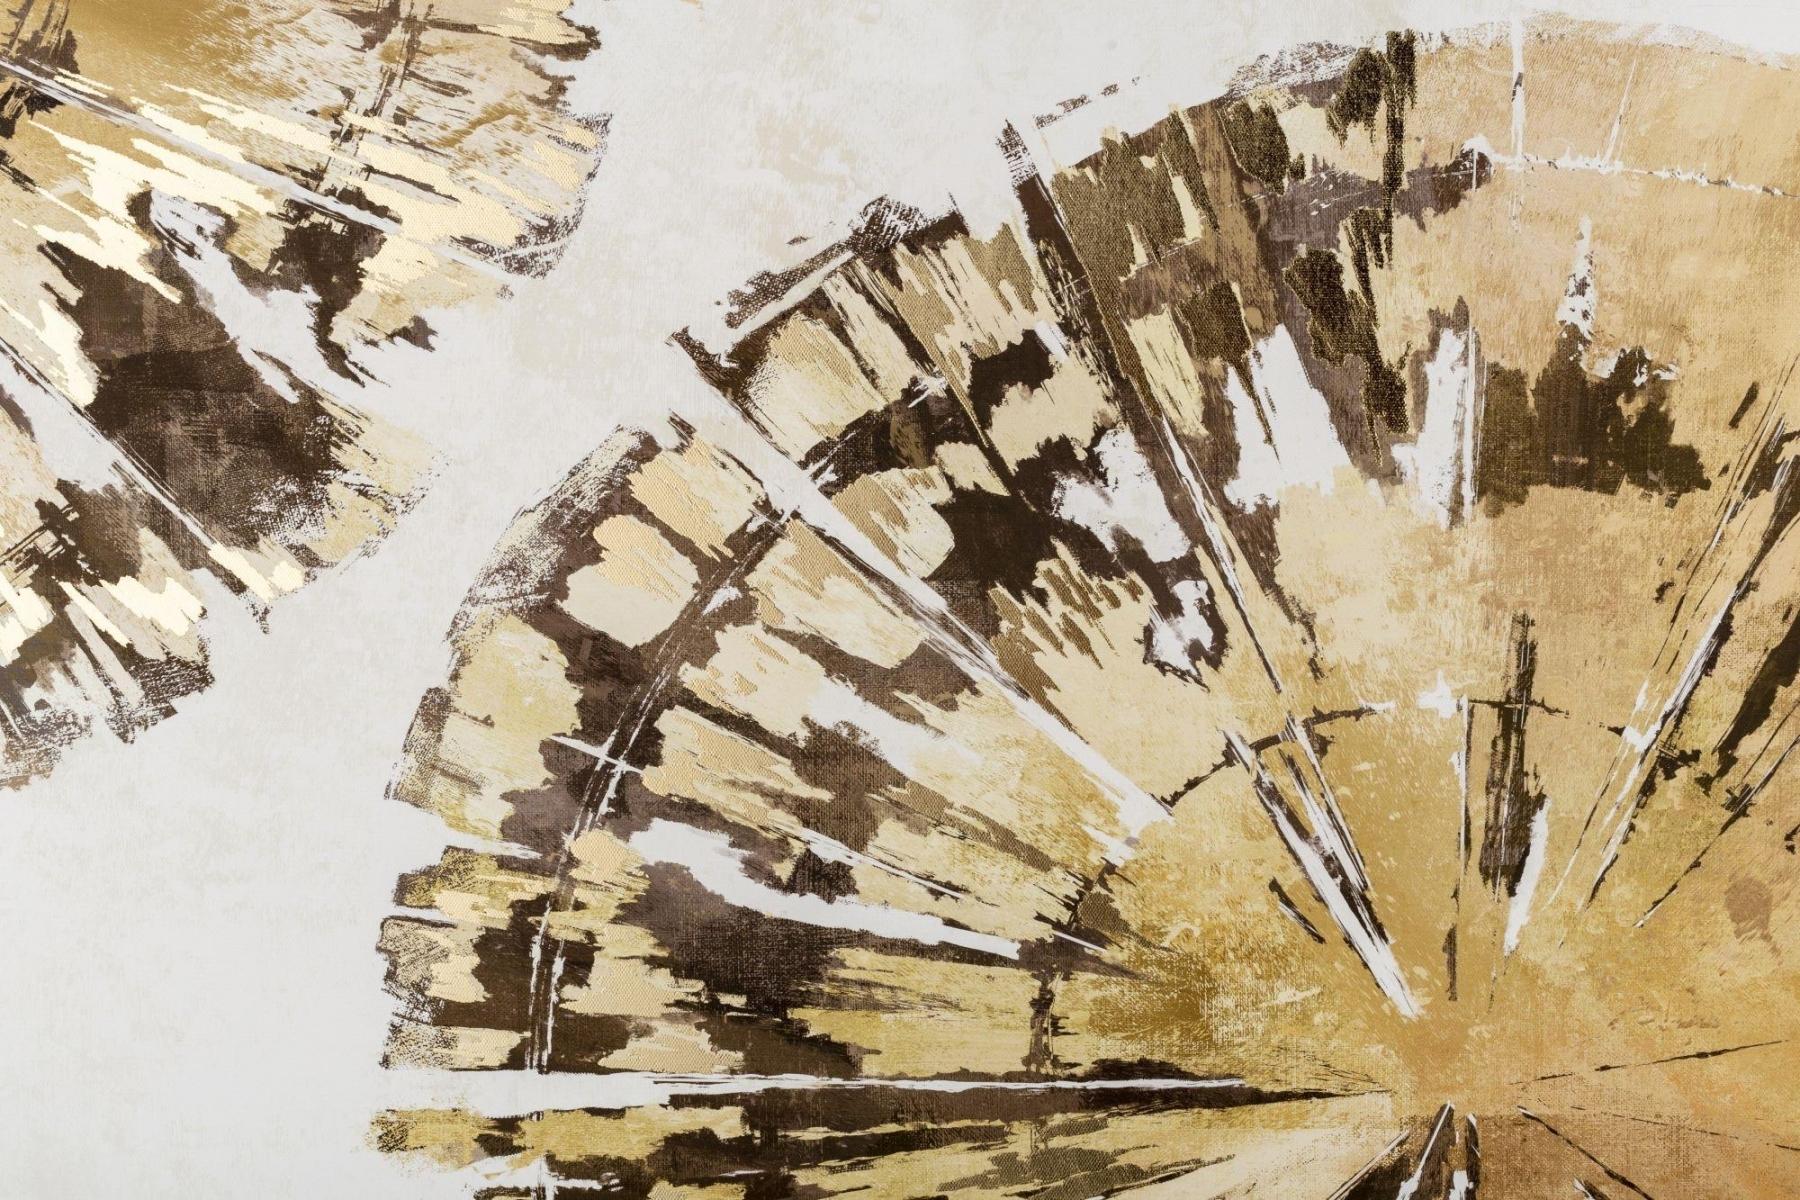 Декоративное интерьерное панно Tomas Stern 87046